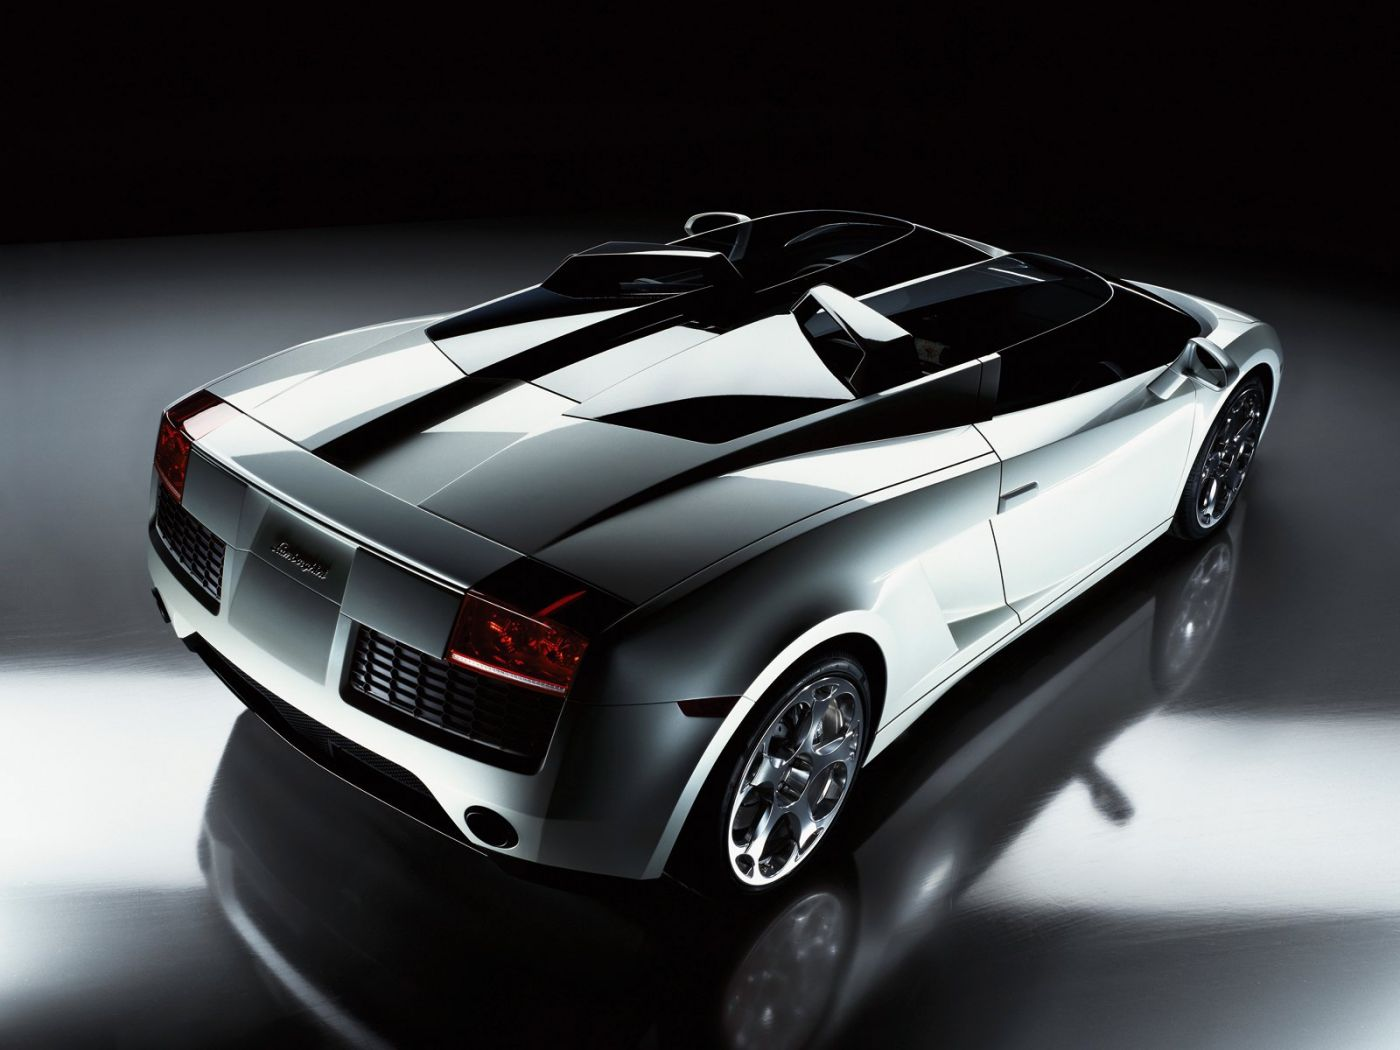 Concept S 2005 Rear High Angle Wallpaper 1400x1050